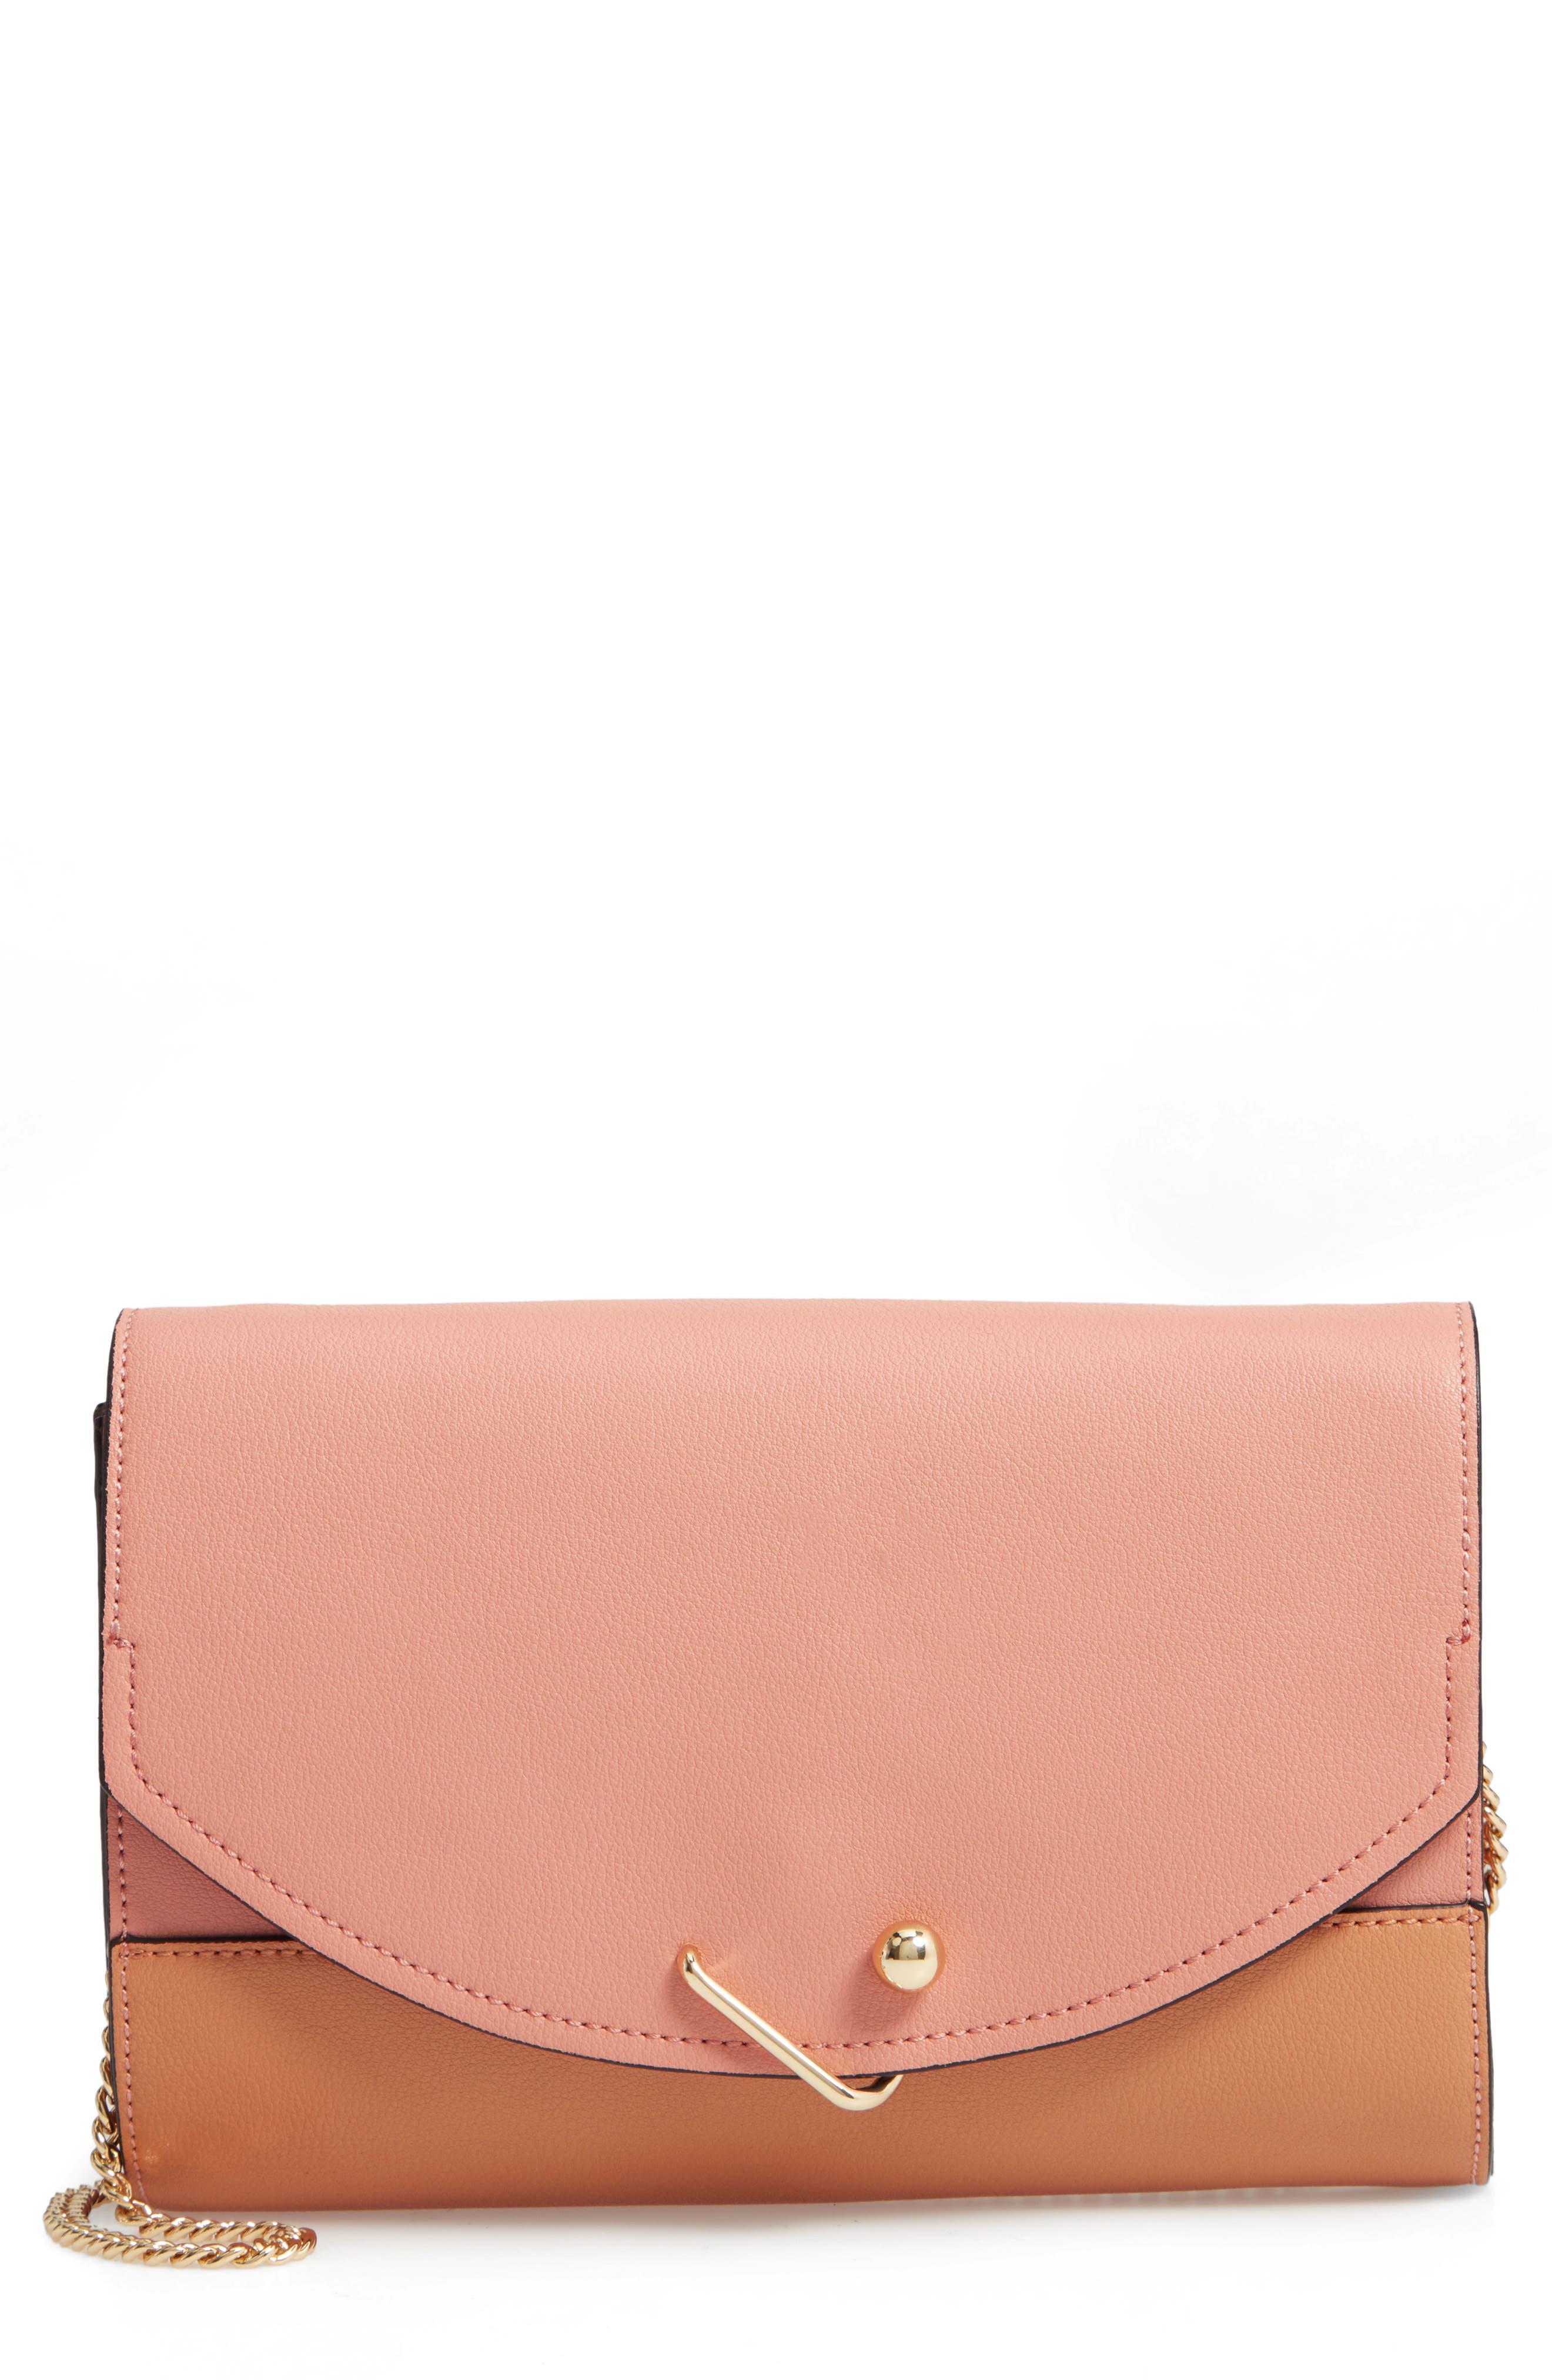 Easton Colorblock Leather Clutch,                             Main thumbnail 1, color,                             BLUSH COMBO